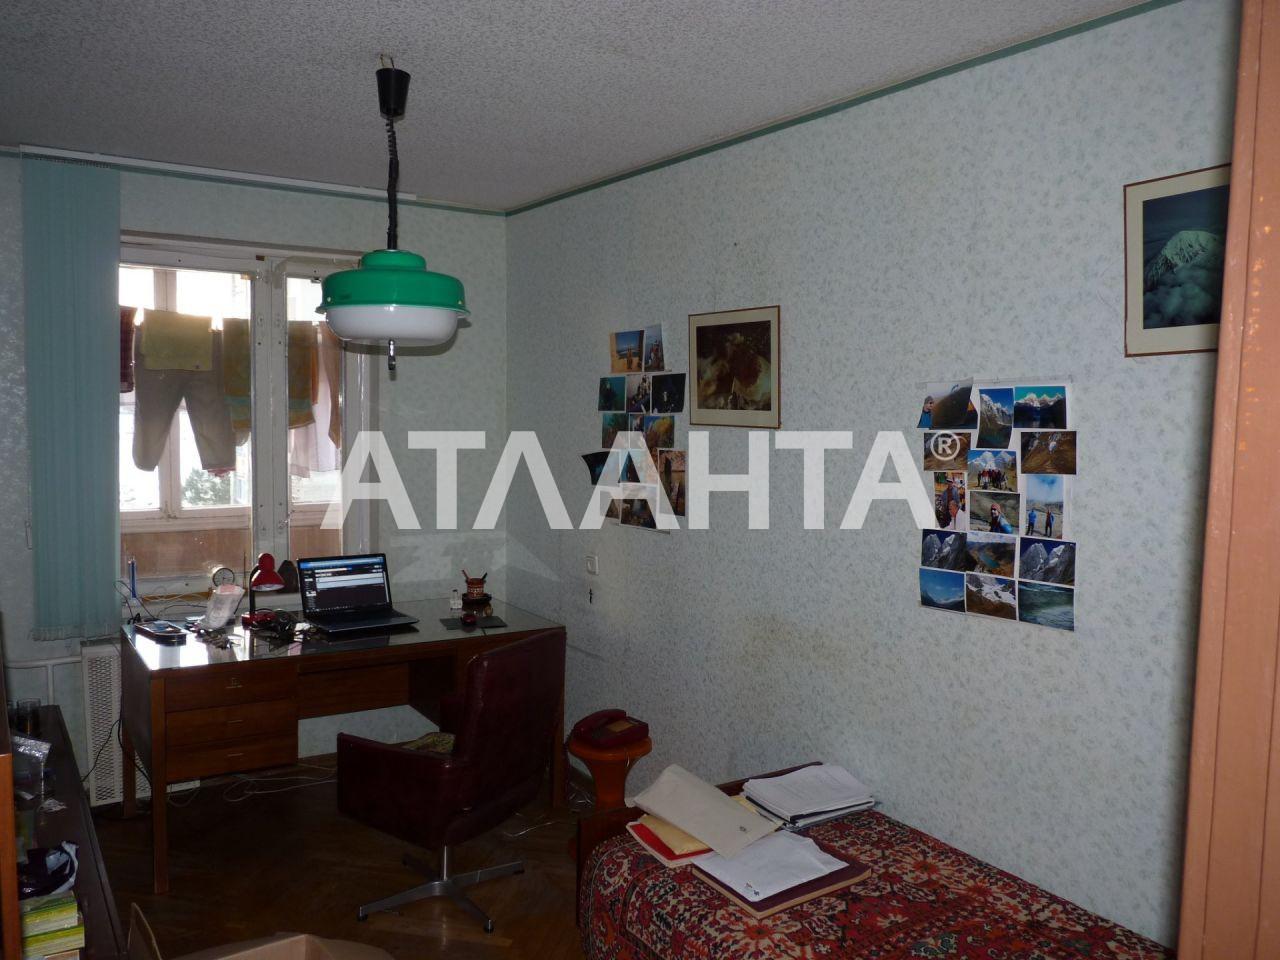 Продается 4-комнатная Квартира на ул. Днепровская Наб. — 65 000 у.е. (фото №4)